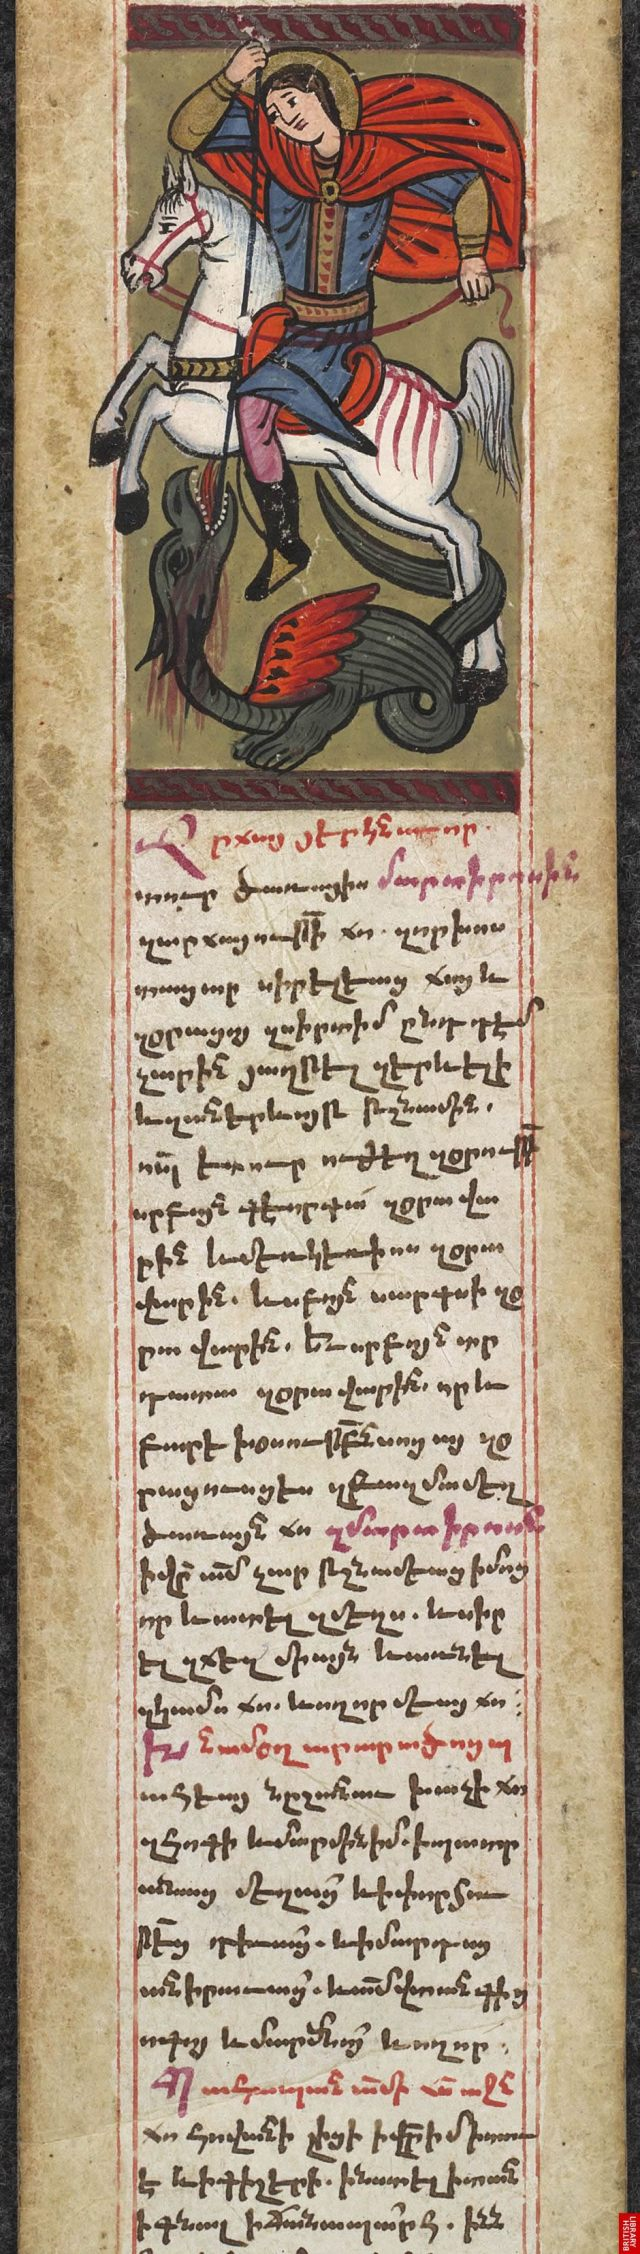 Armenian Prayer Scroll or Amulet with St. Sargis on horseback, Constantinople, 1655.